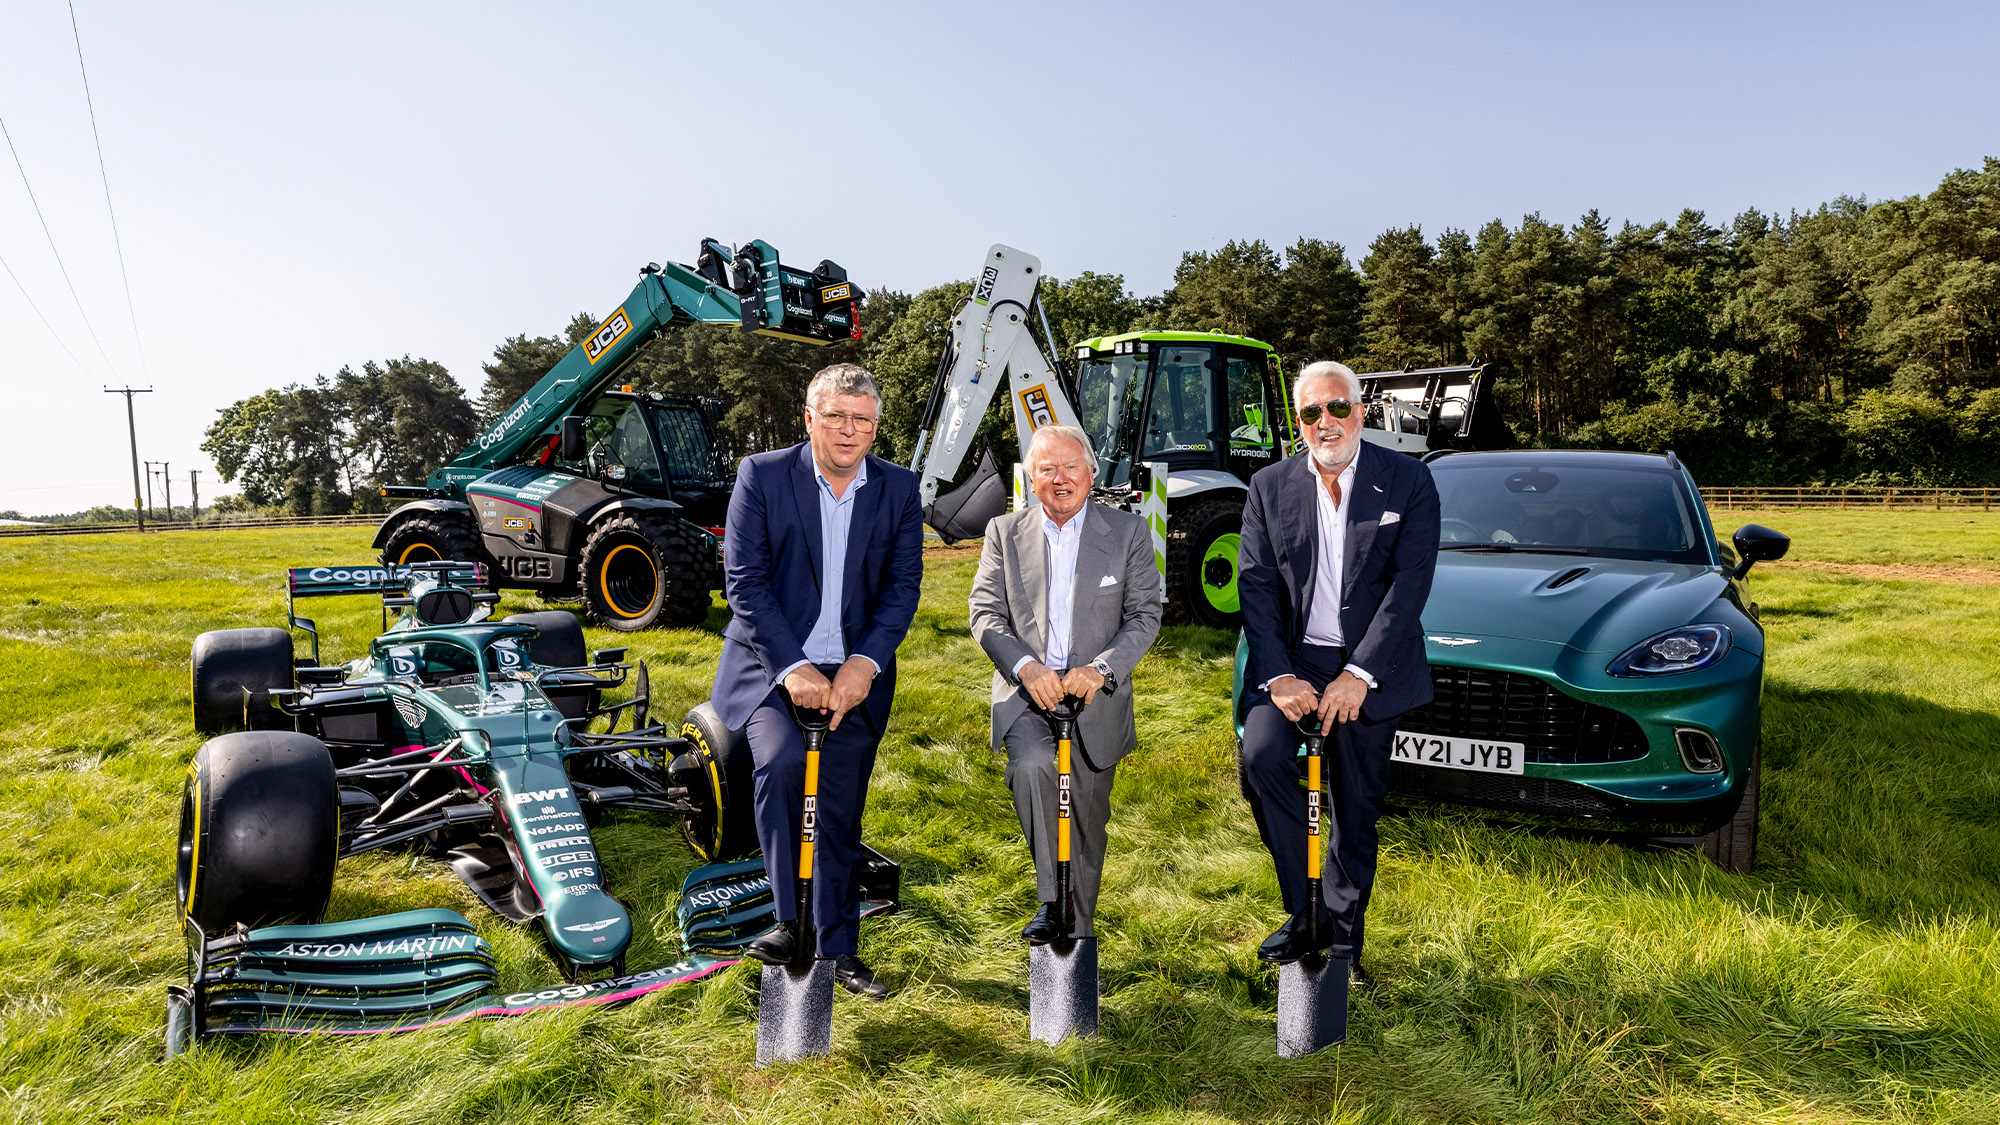 Breaking ground on the new Aston Martin F1 factory